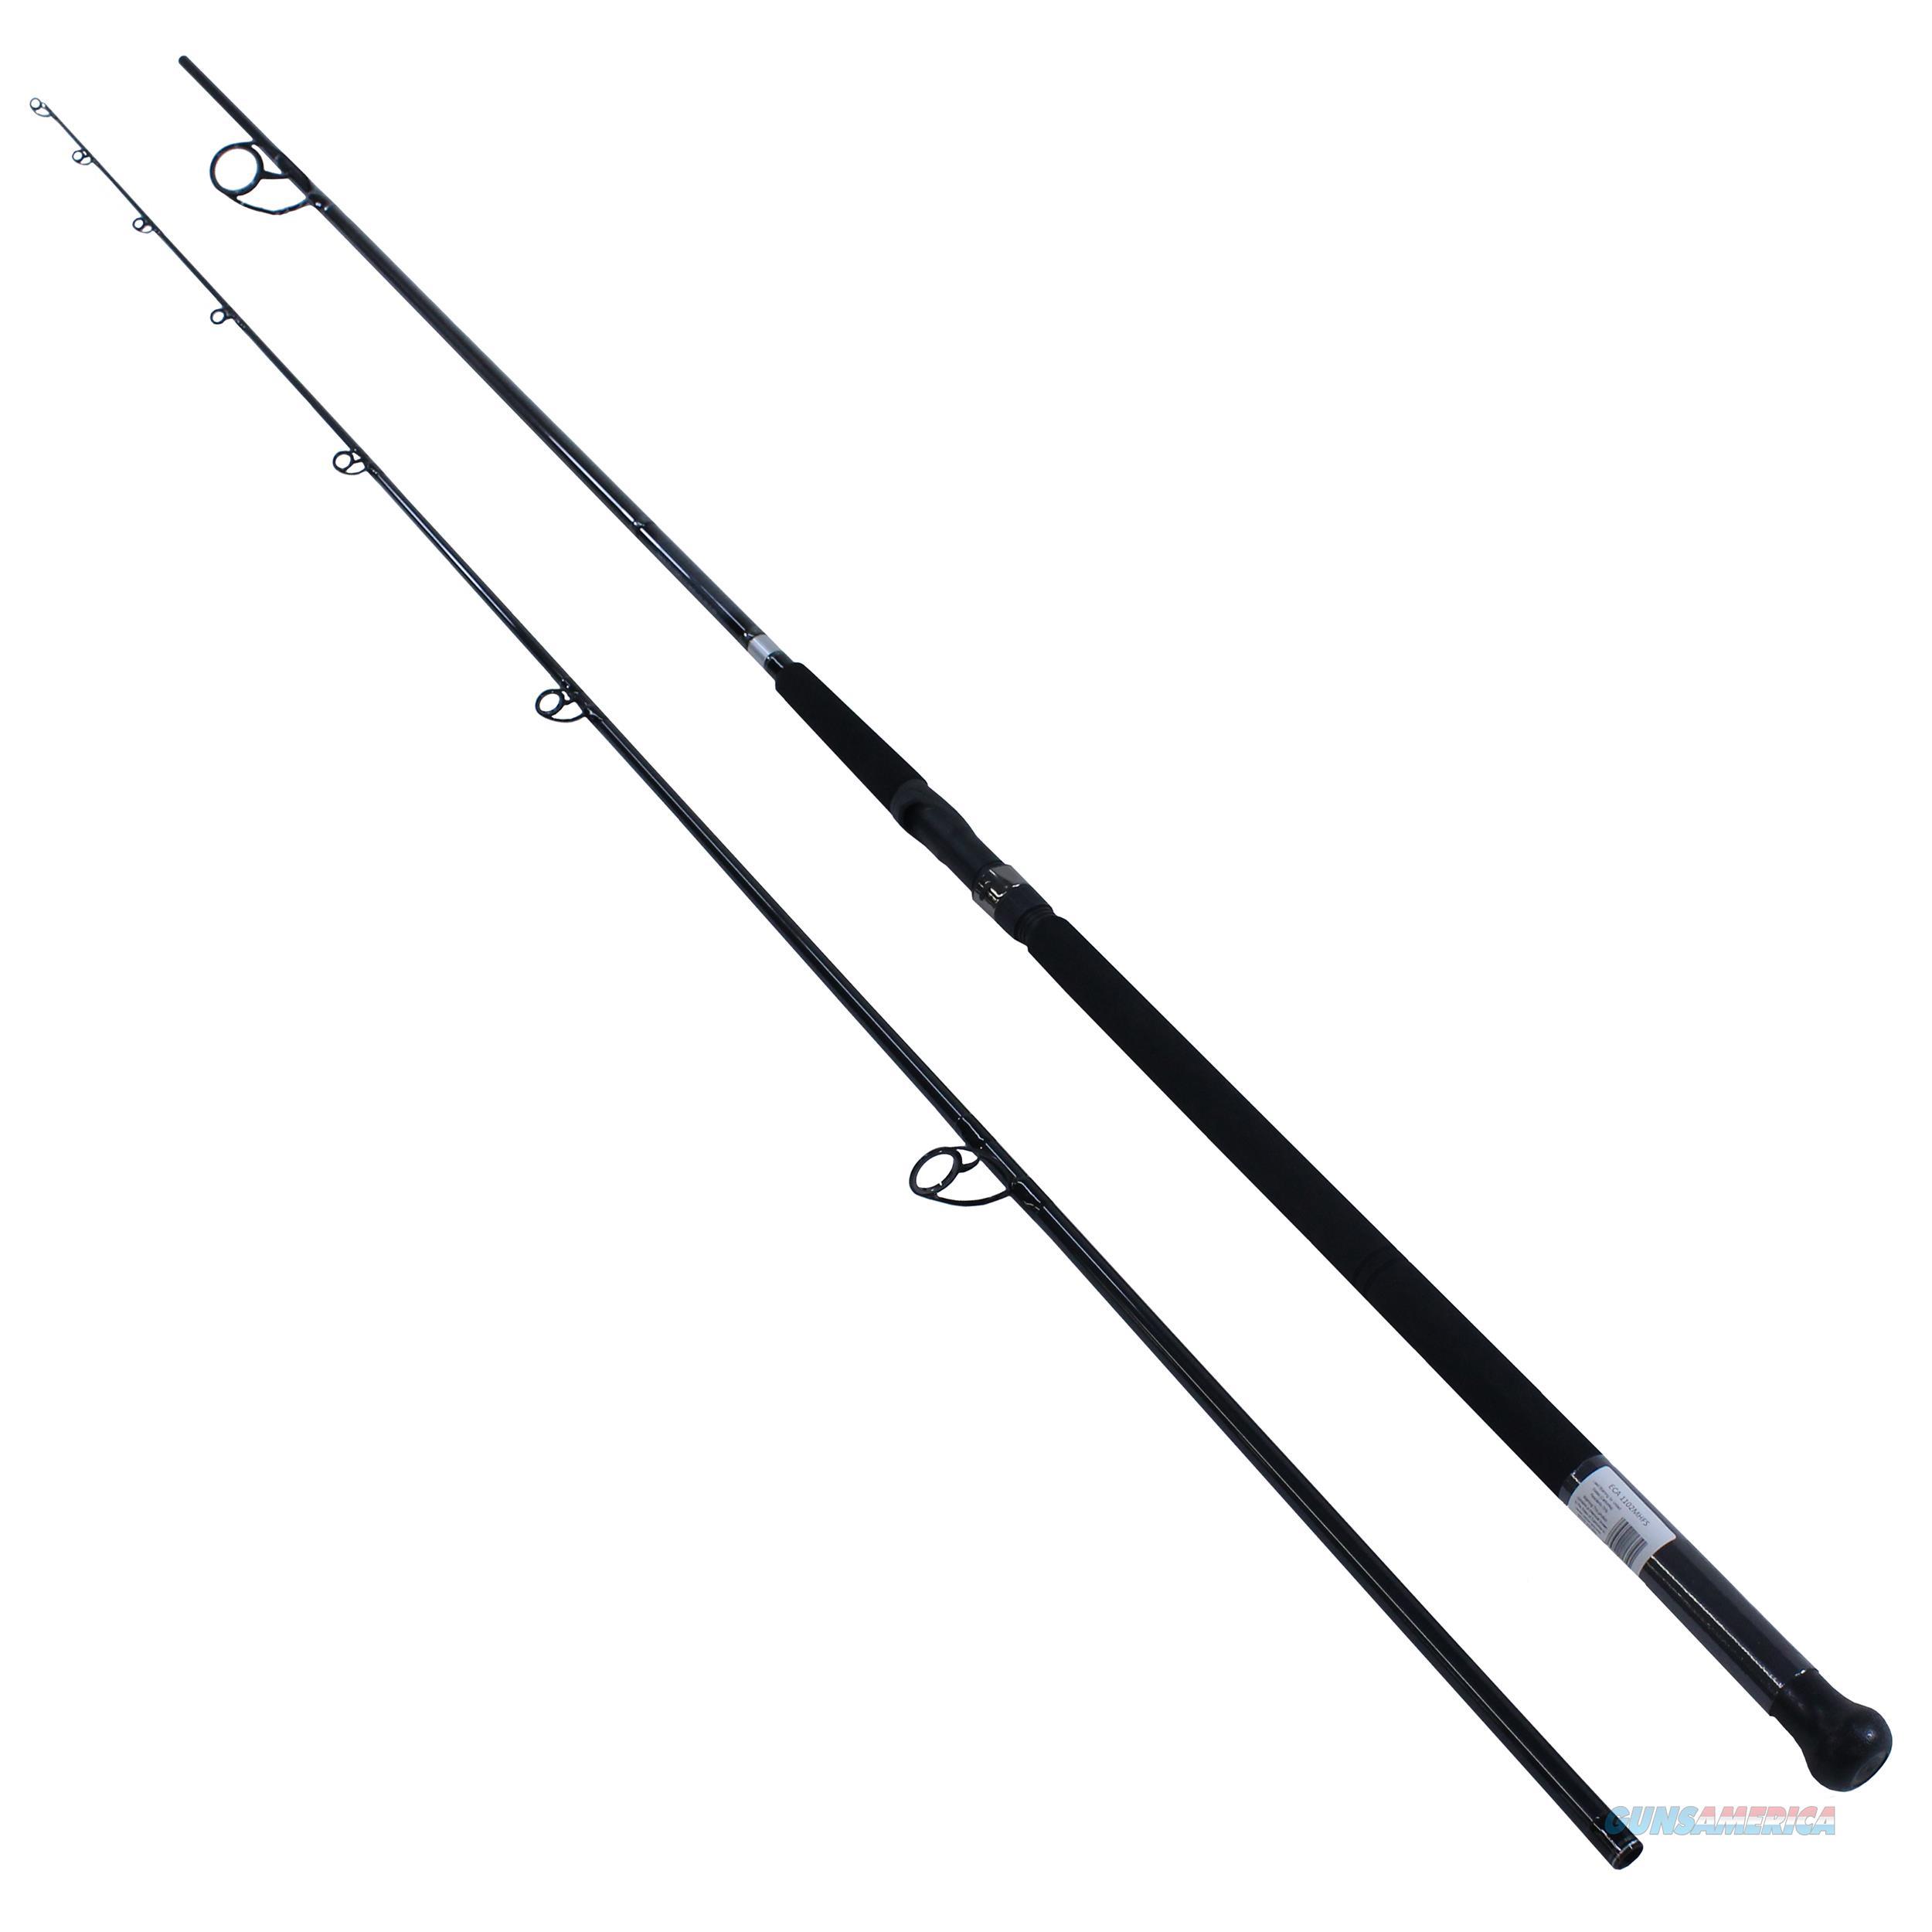 Daiwa Emcast Surf Spinning Rod ECA1202HFS  Non-Guns > Fishing/Spearfishing